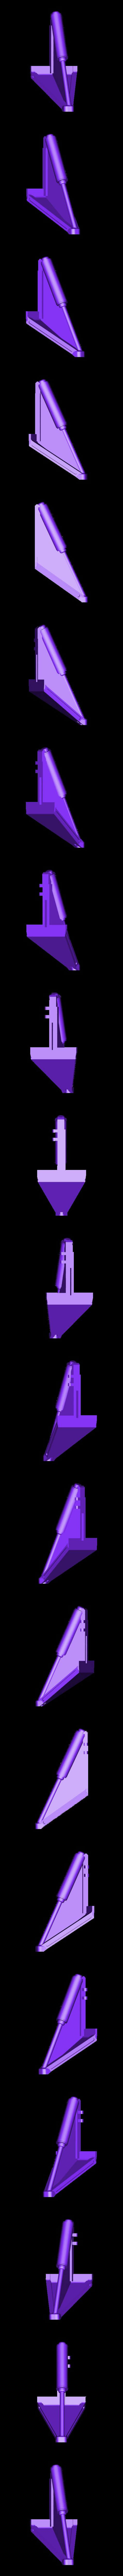 Viking 3D Leg x 3.stl Download free STL file Viking Lander - STL • 3D printable object, spac3D